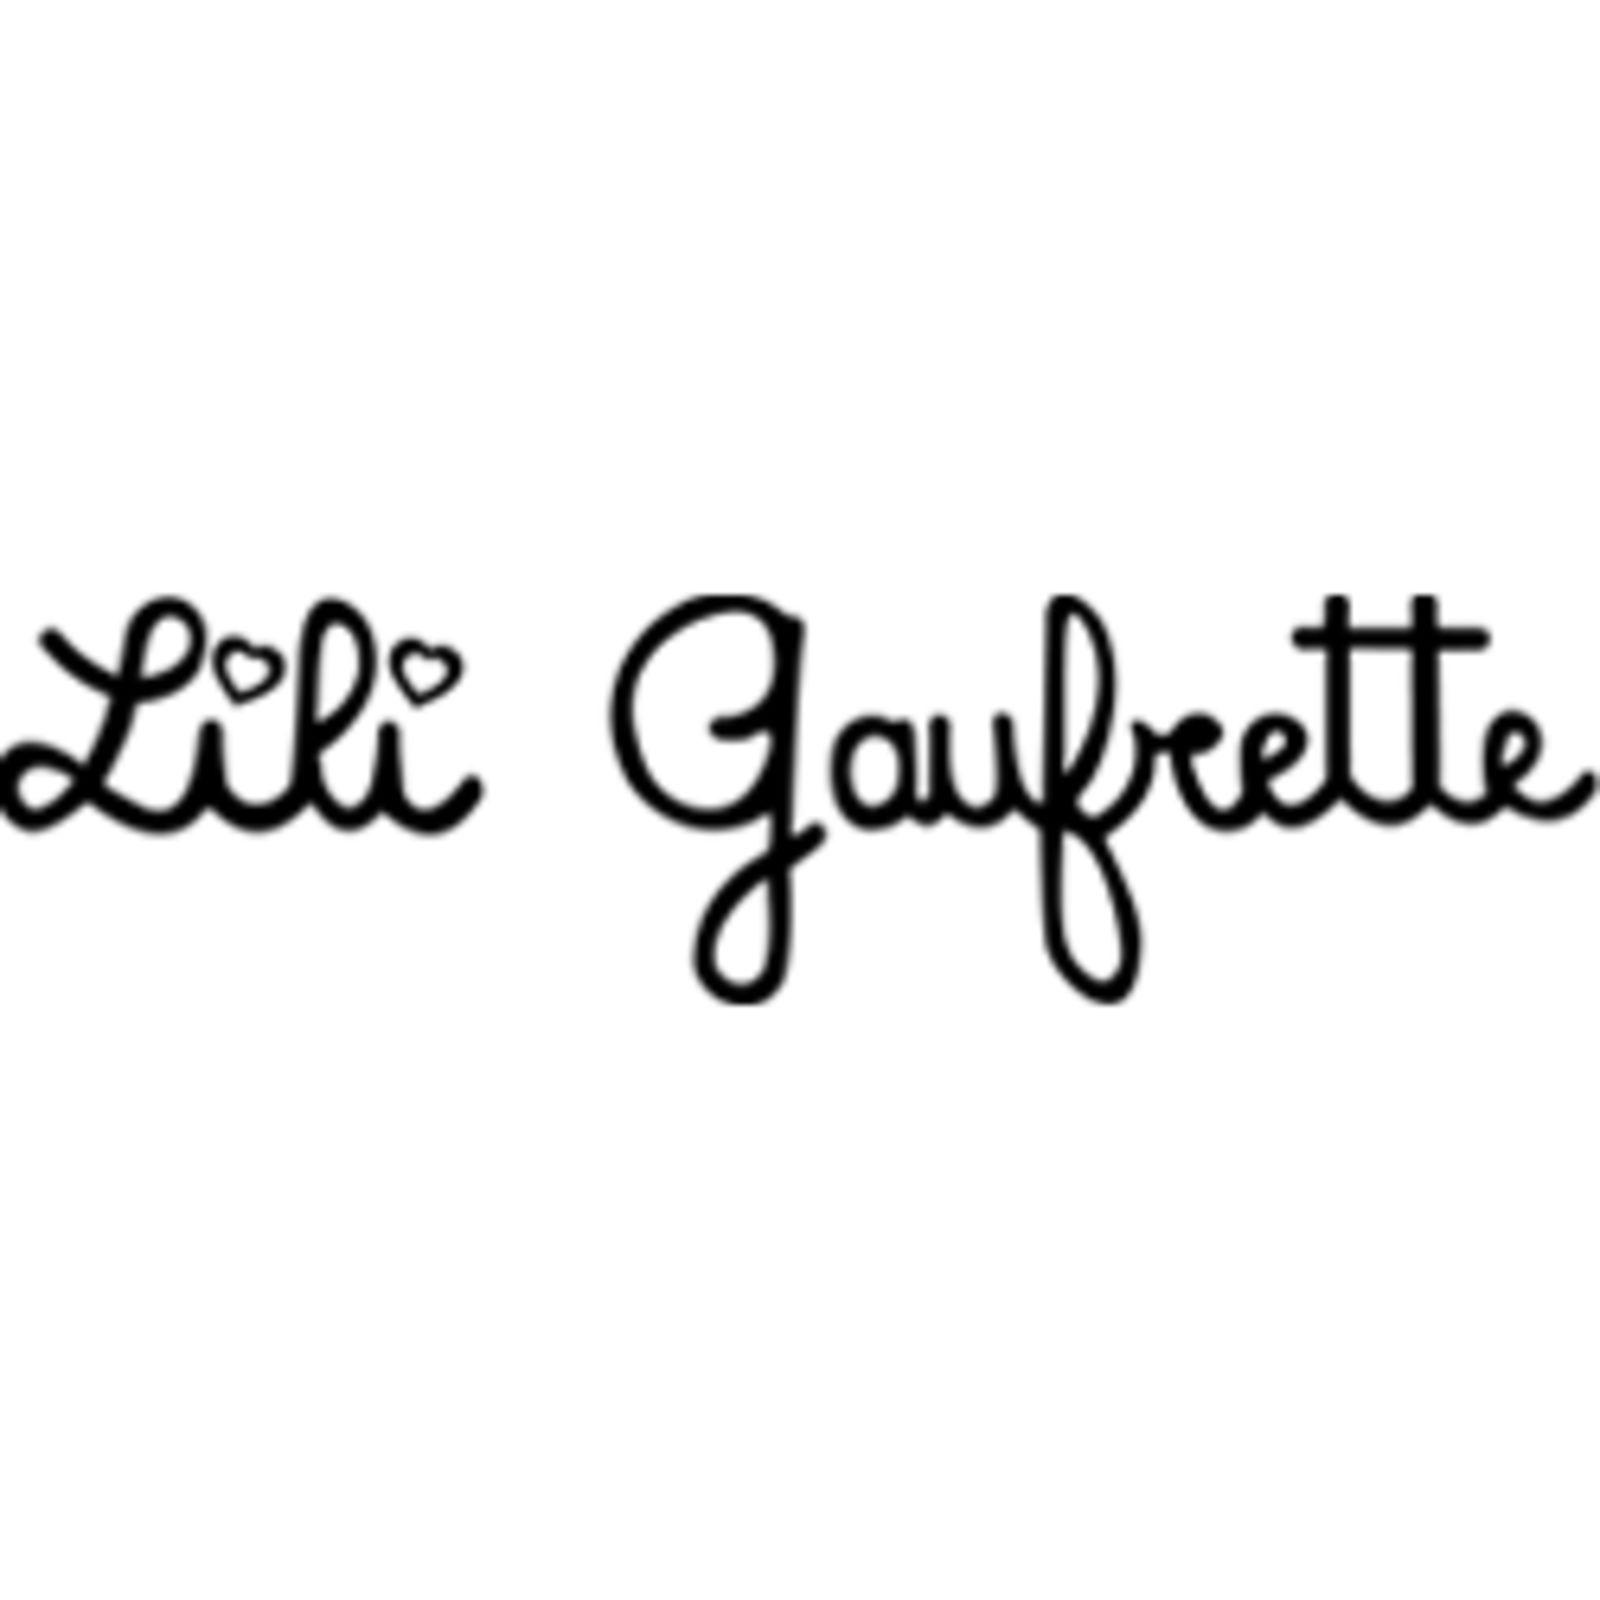 Lili Gaufrette